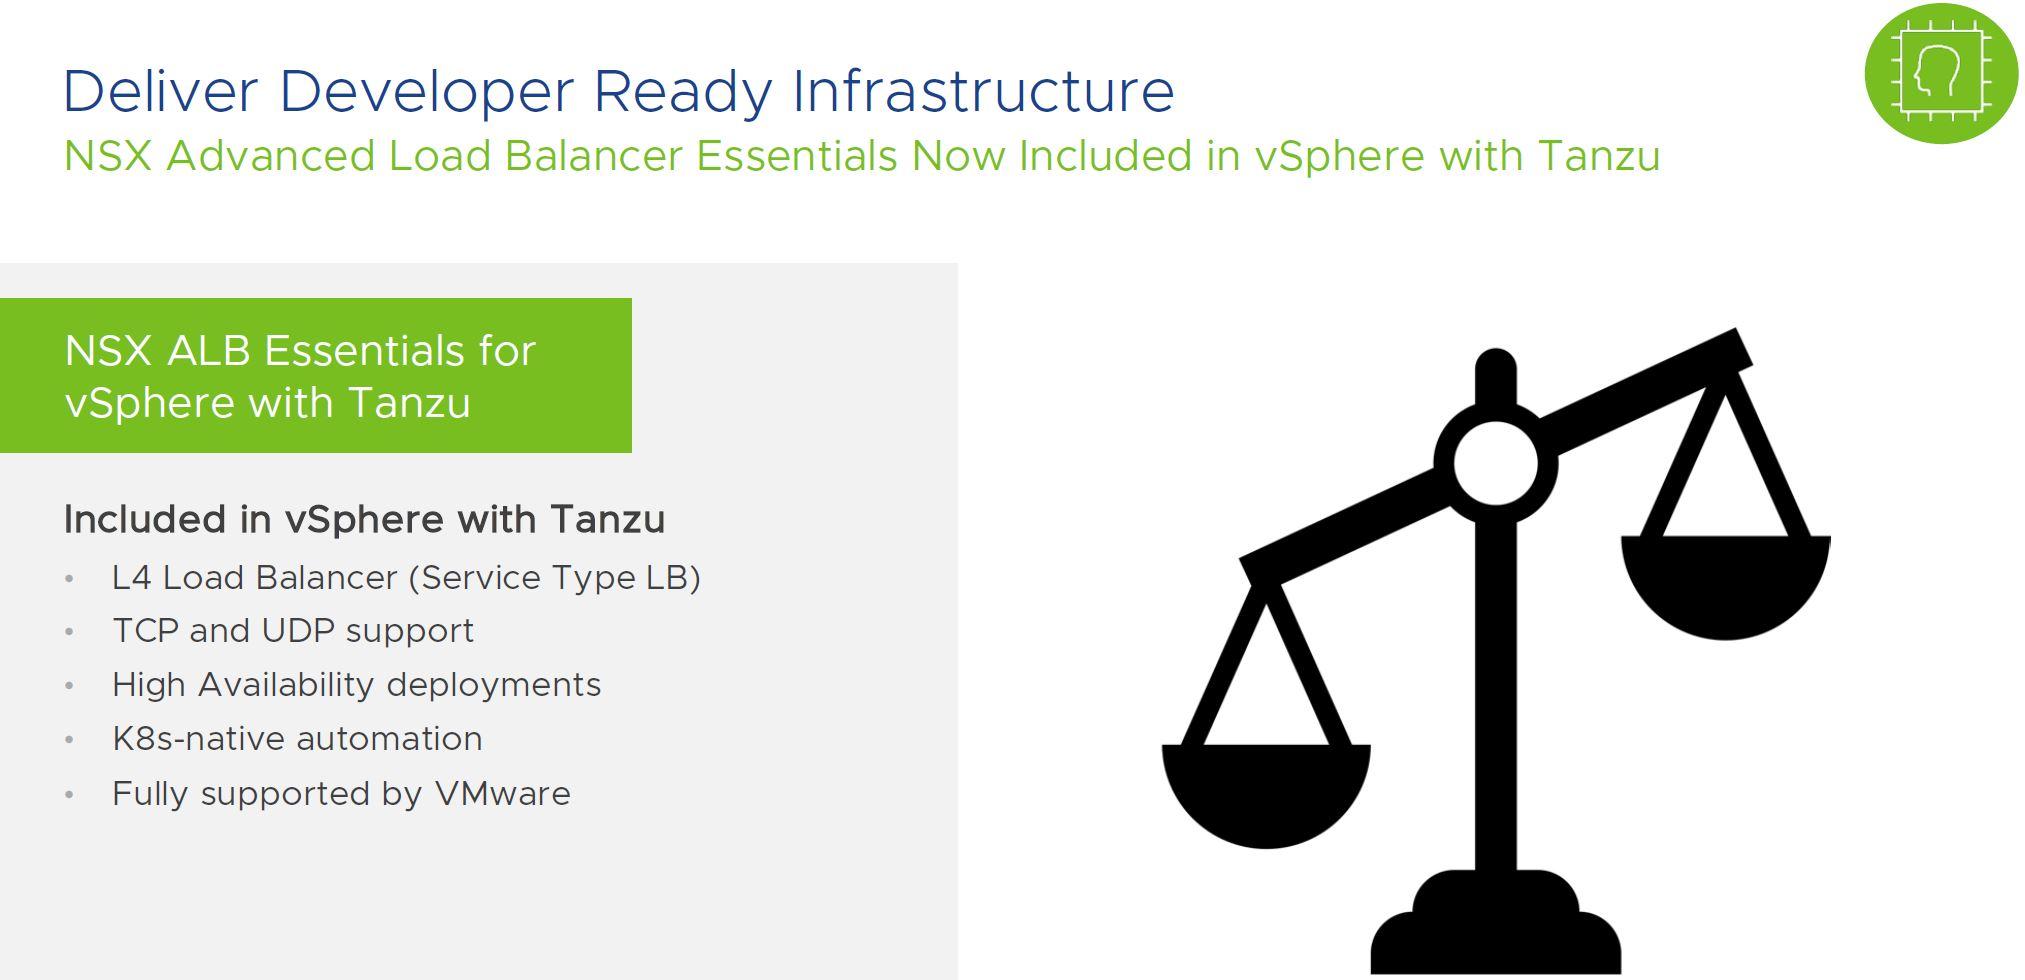 VMware NSX Advanced Load Balancer